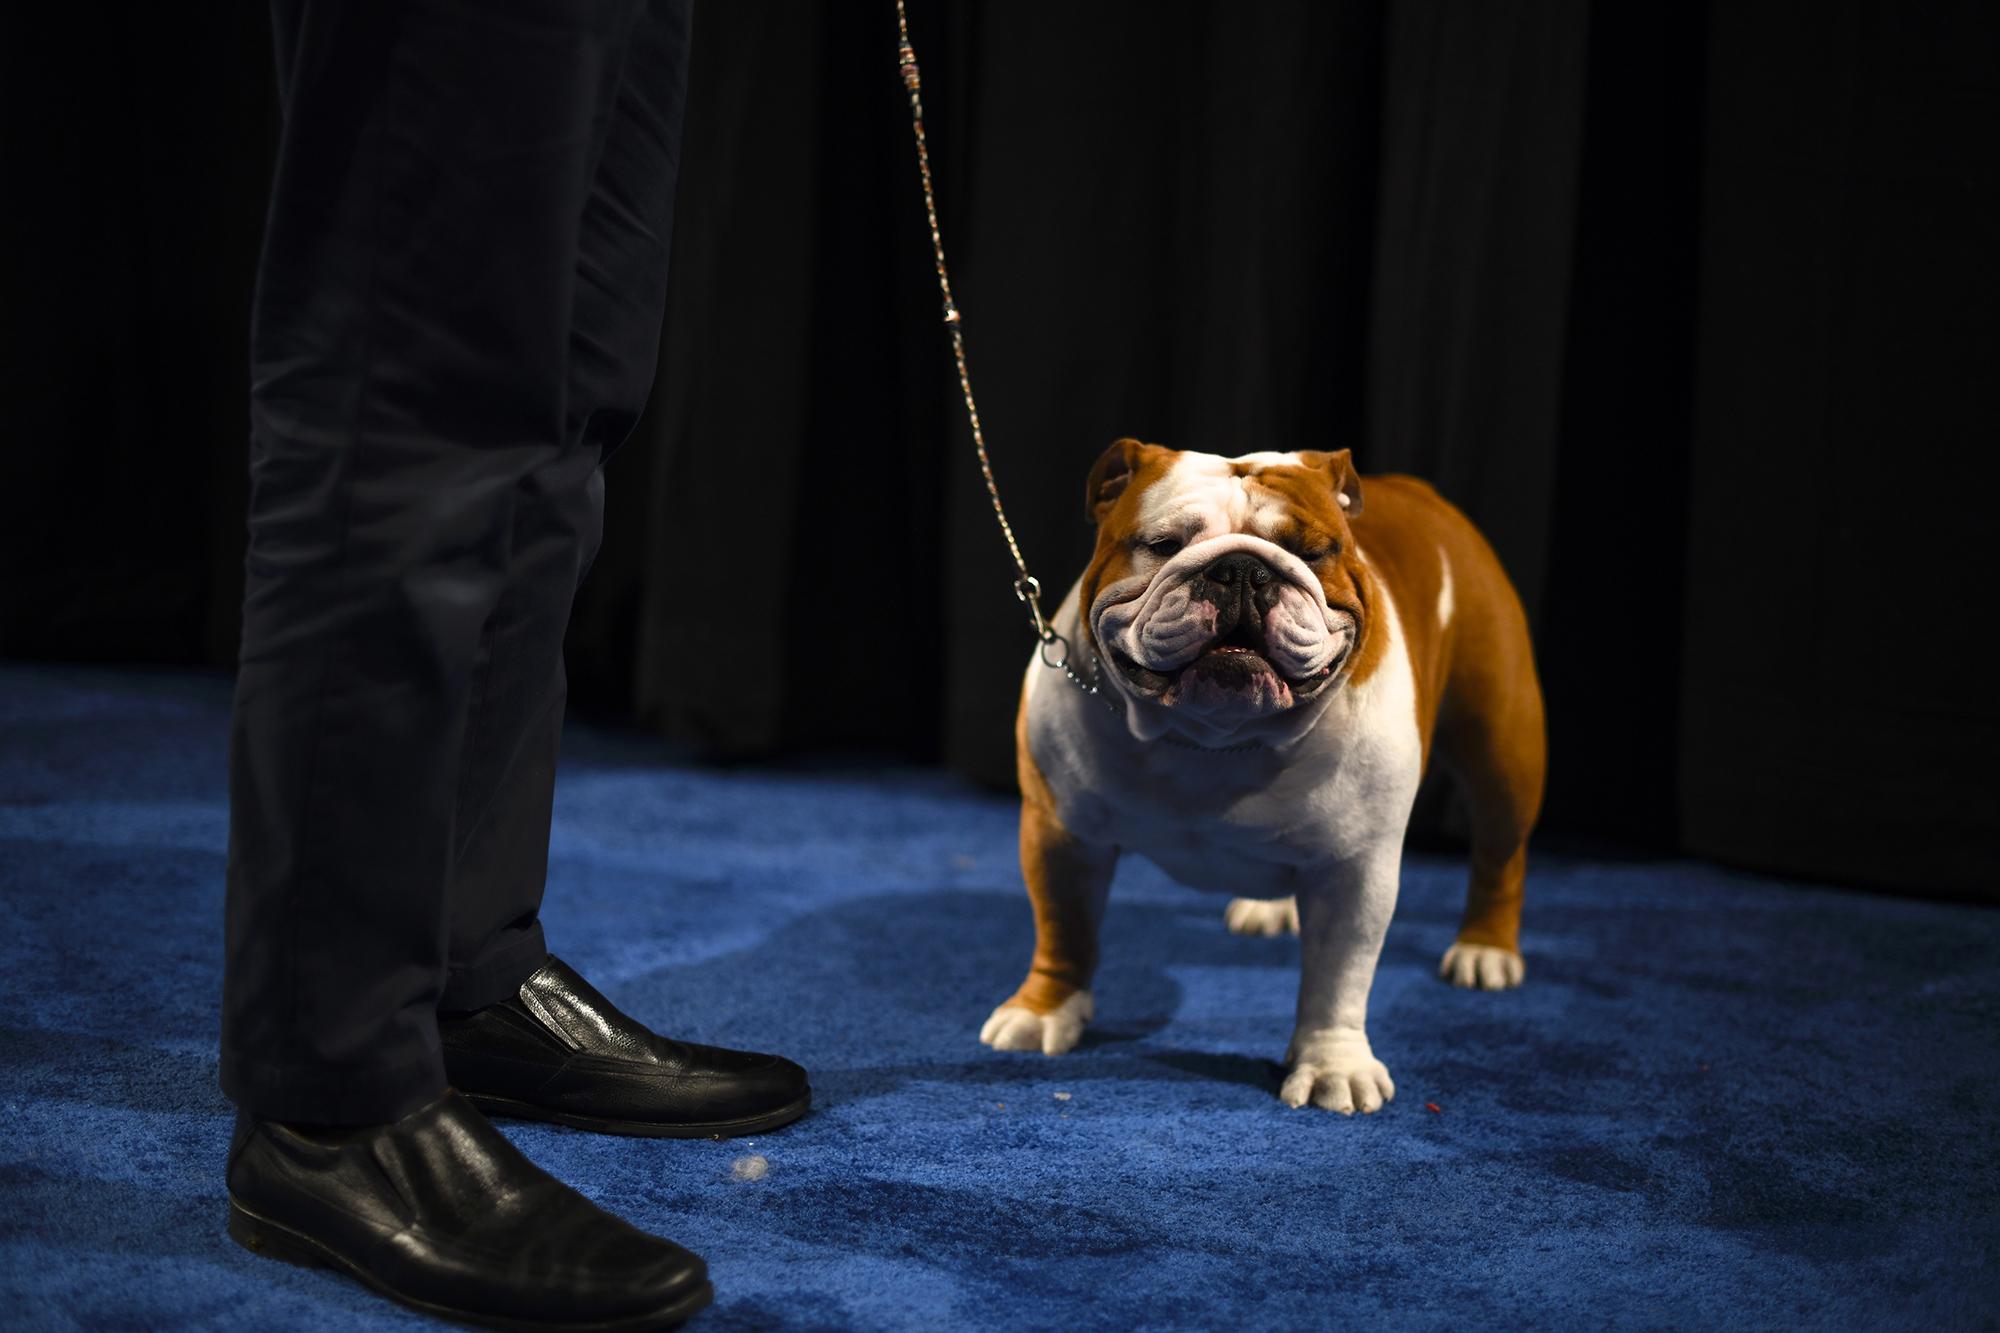 national dog show 2020 - photo #6